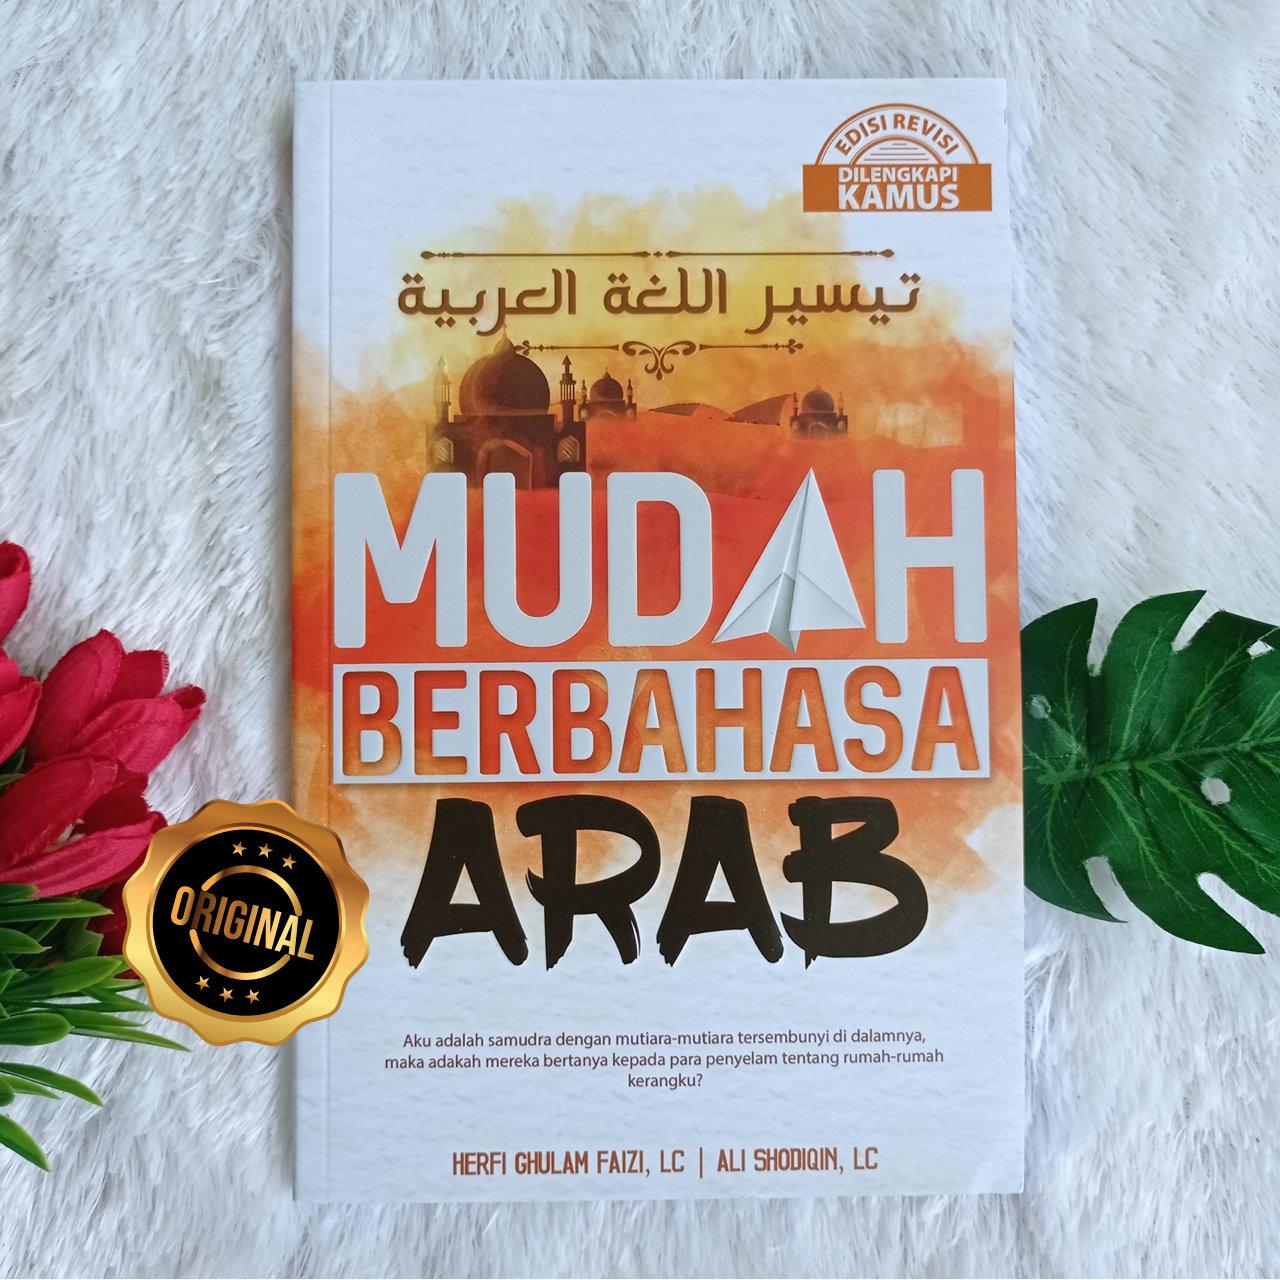 Buku Modul Mudah Berbahasa Arab Metode Tadabburi Dilengkapi Kamus